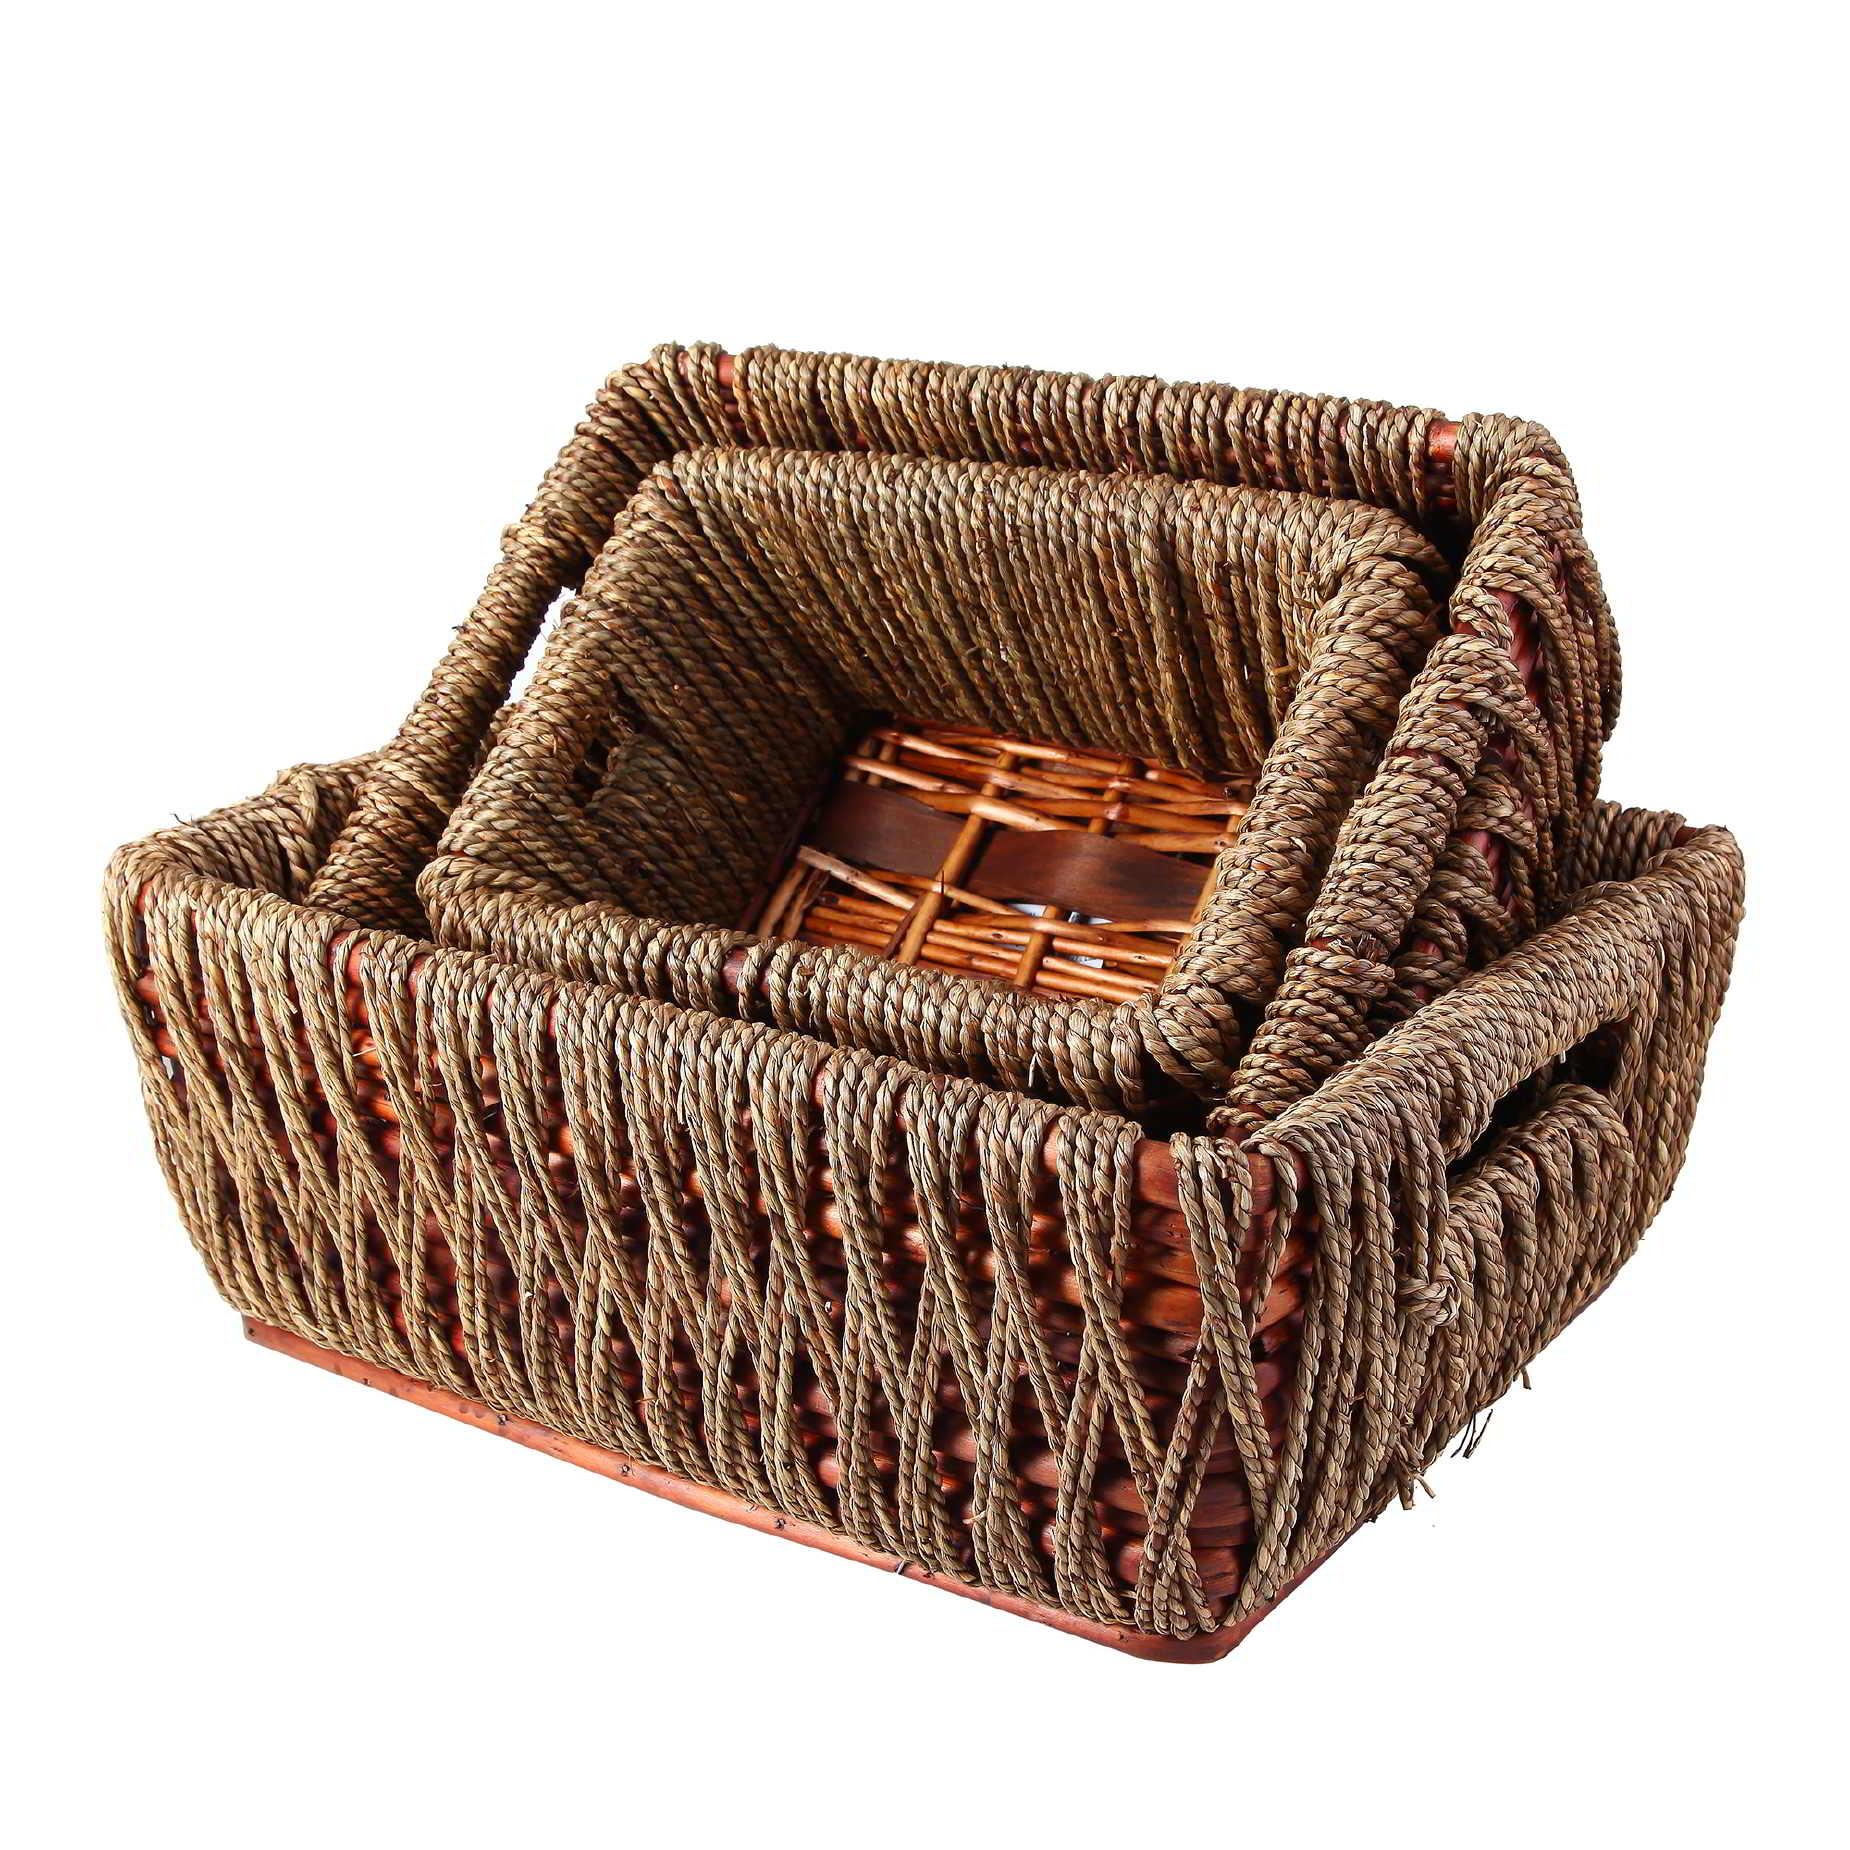 Conjunto de cestas retangular